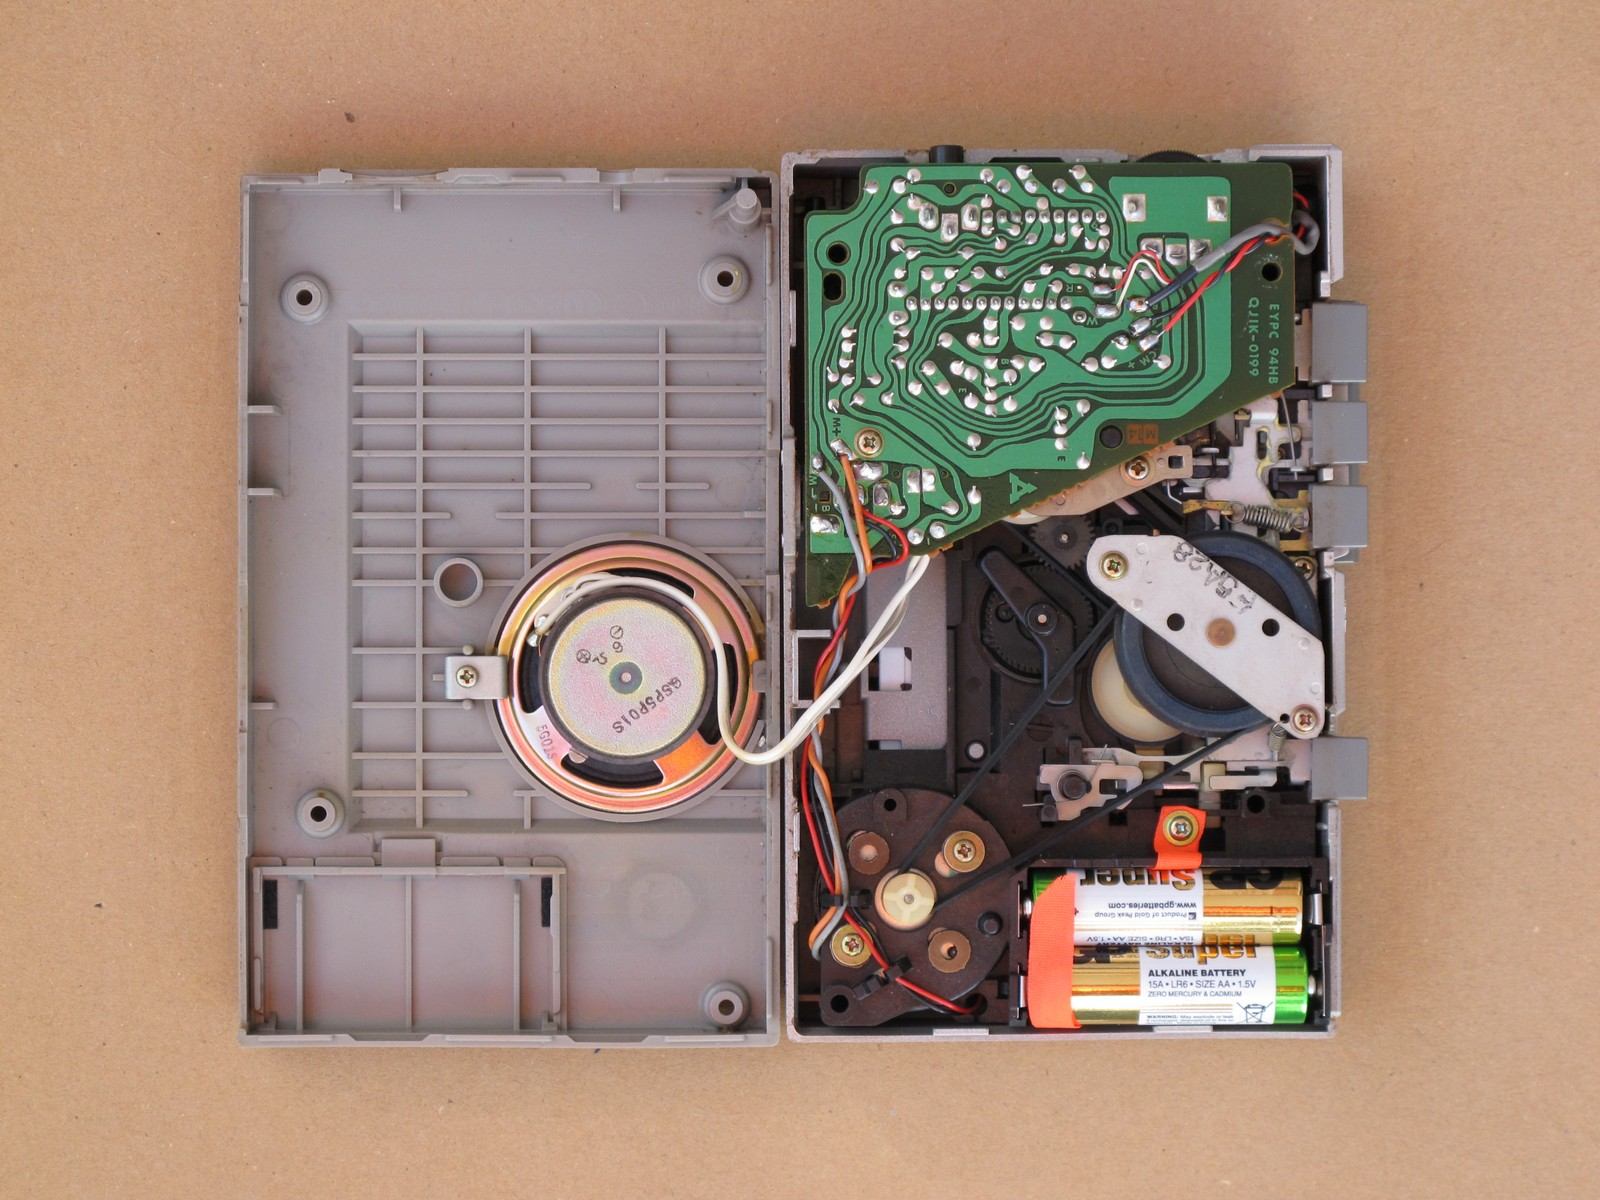 Opened Panasonic RQ340 cassette recorder